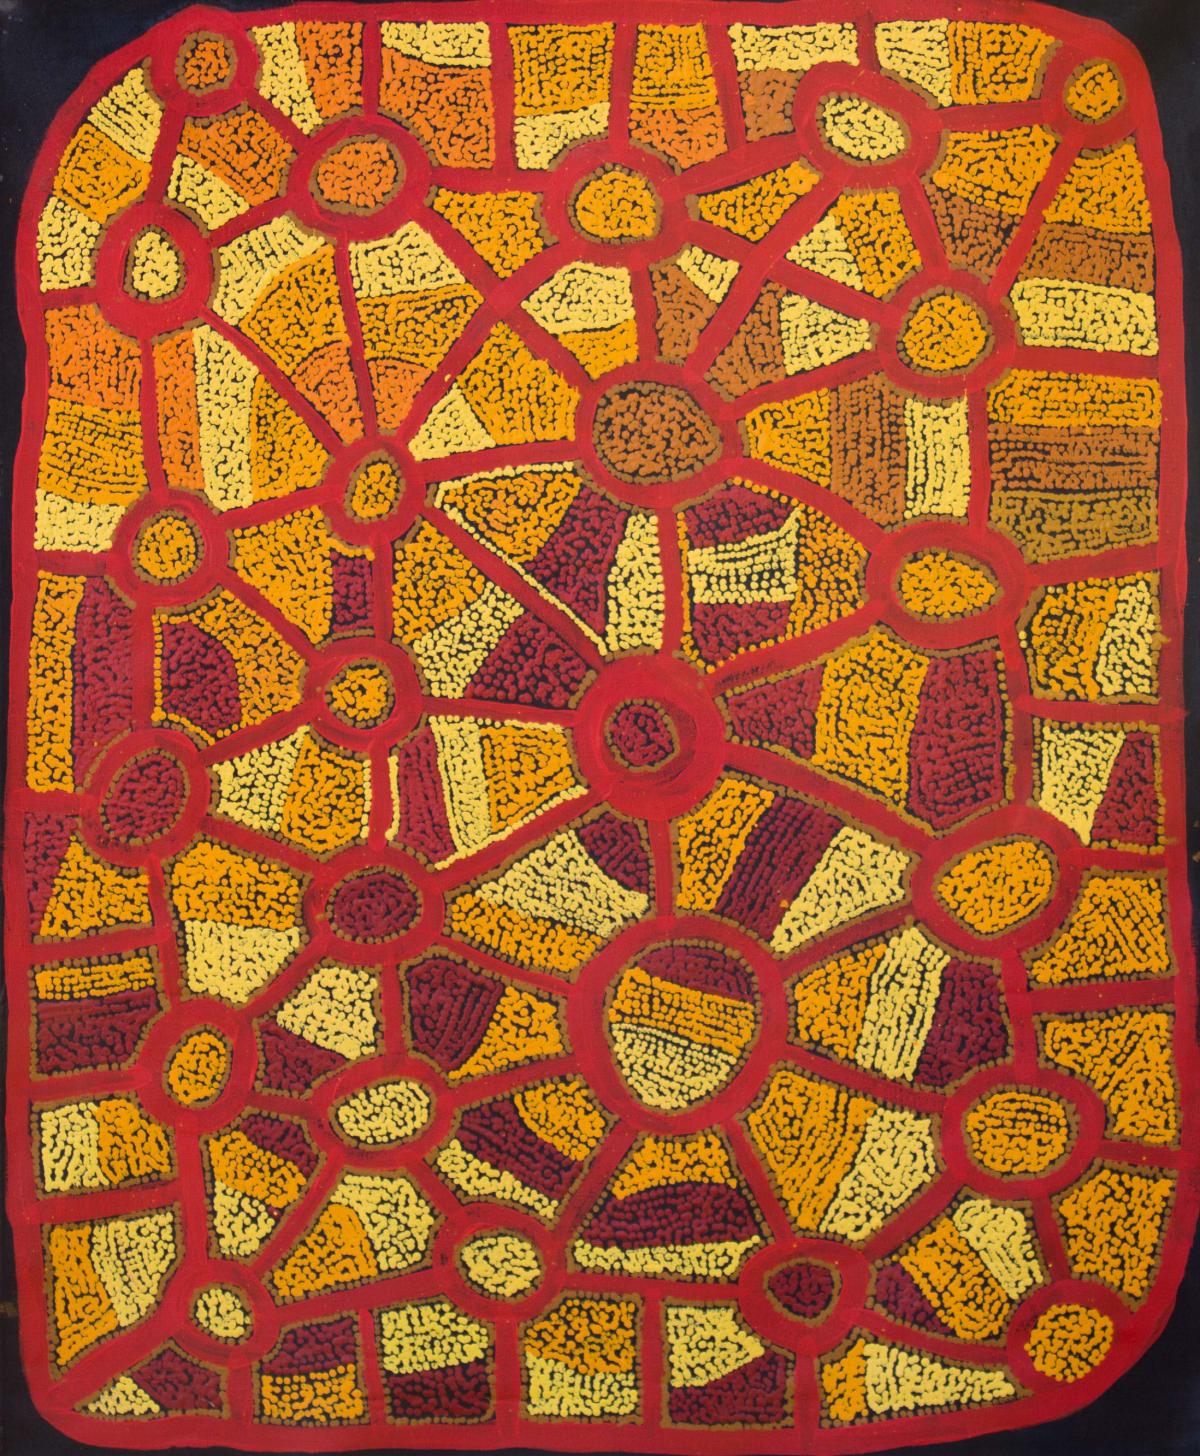 Ian Rictor Tuwan acrylic on linen 110 x 91 cm